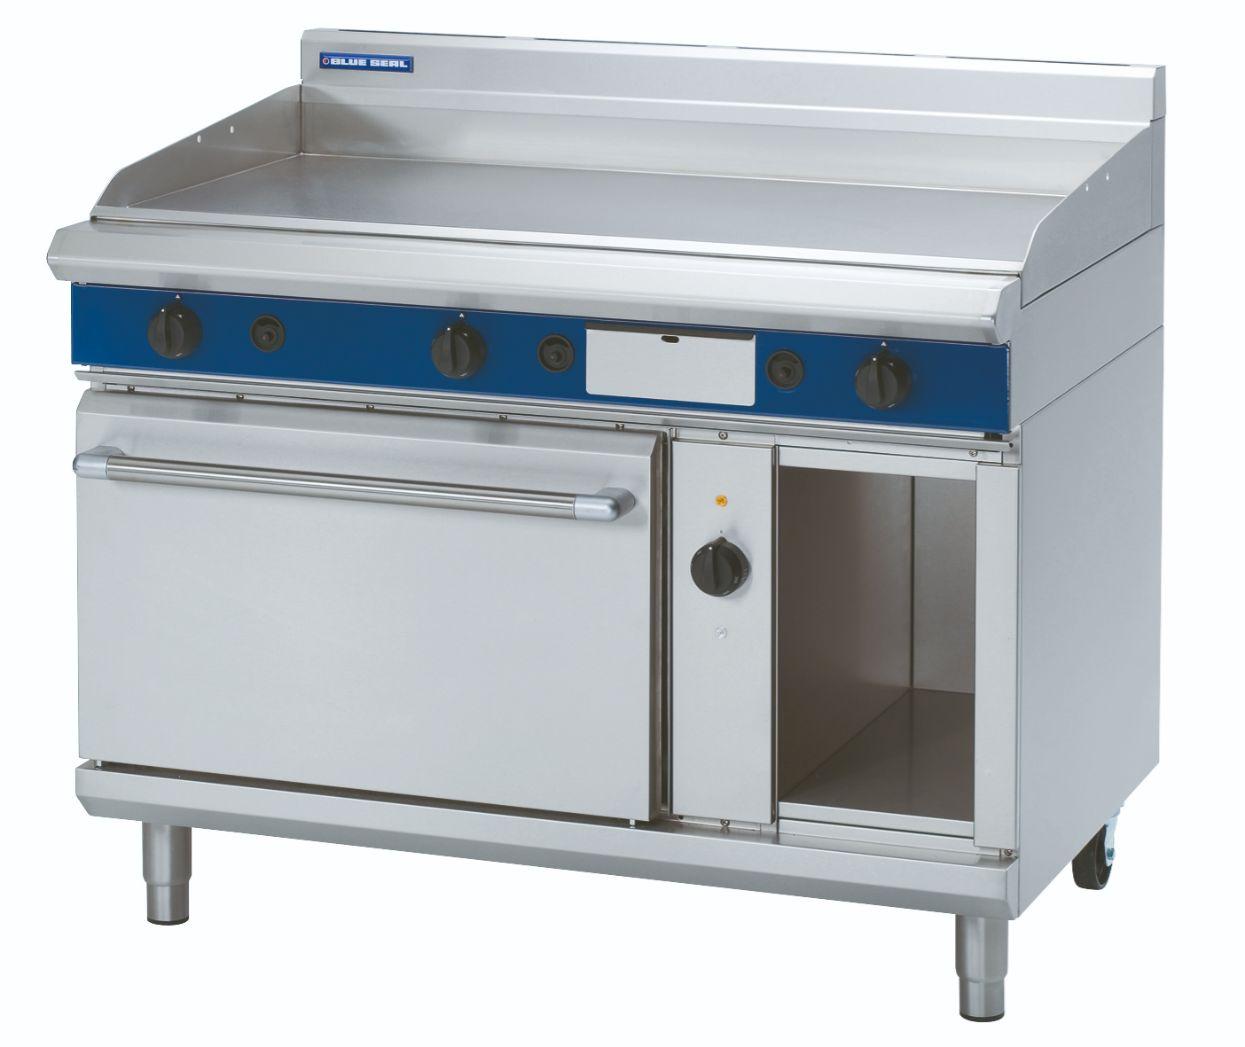 Blue Seal Evolution Series GPE58 - 1200mm Gas Griddle Electric Convection Oven Range